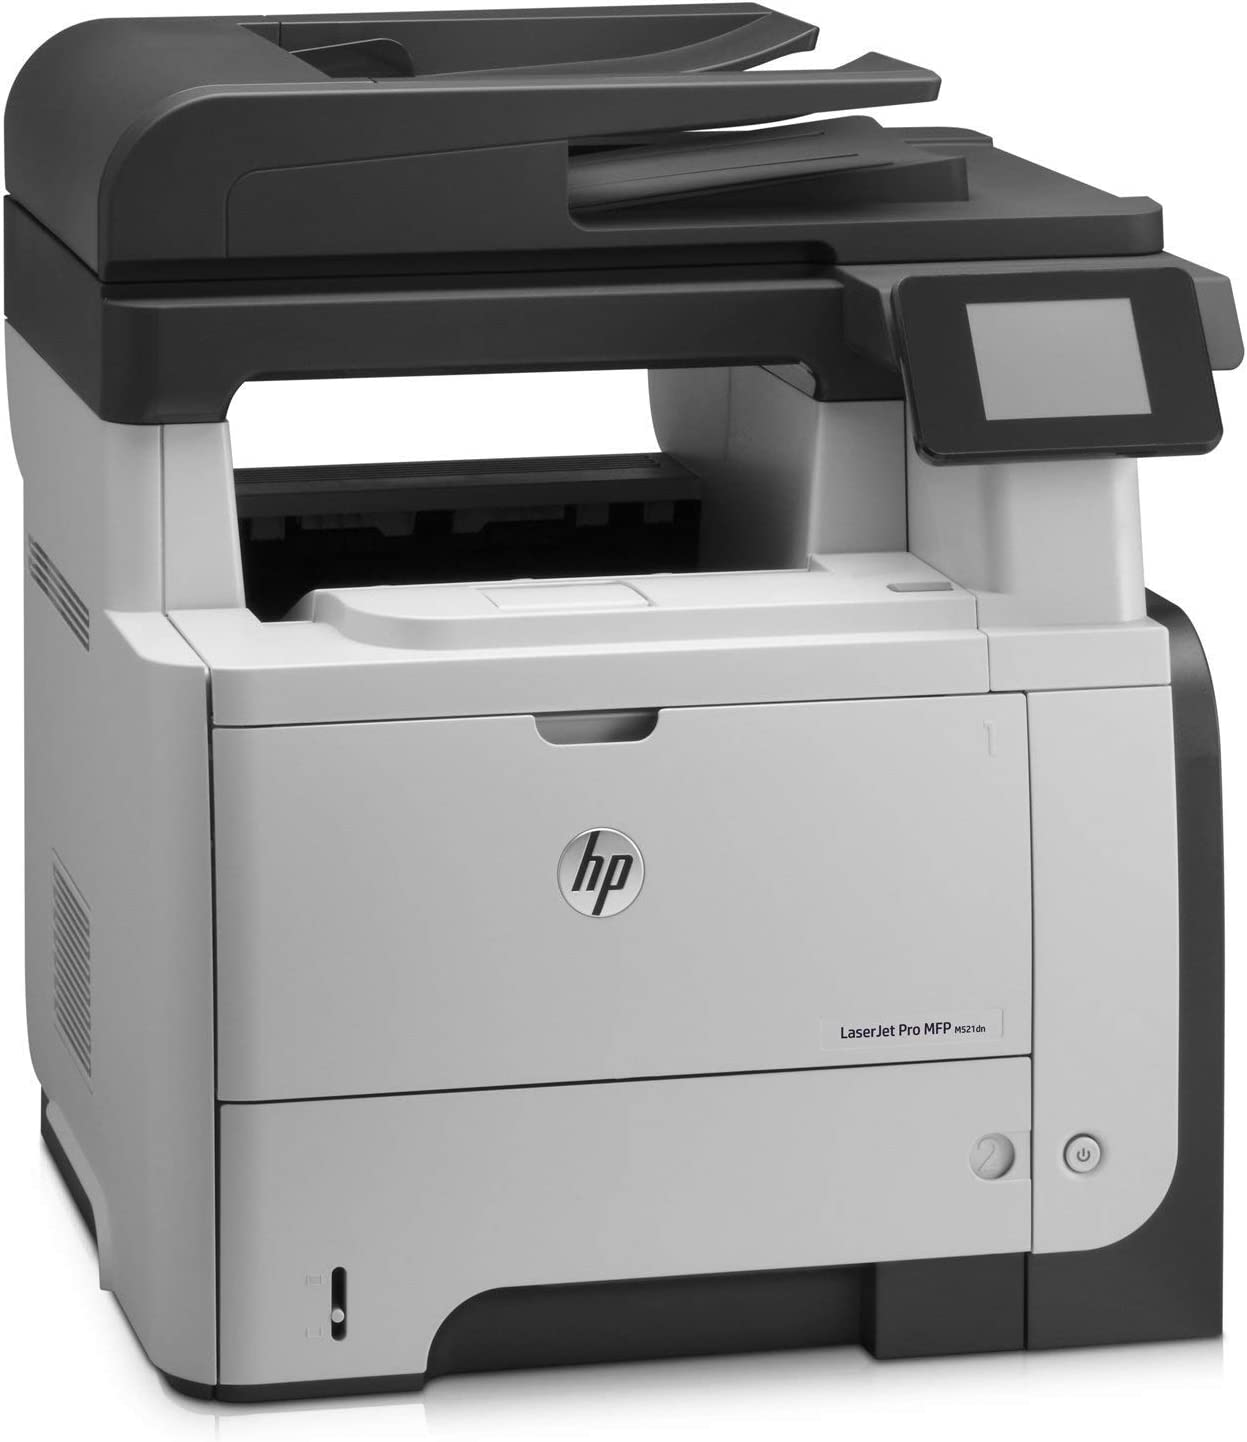 HP Laserjet Pro MFP M521dn Printer, (A8P79A) (Renewed)